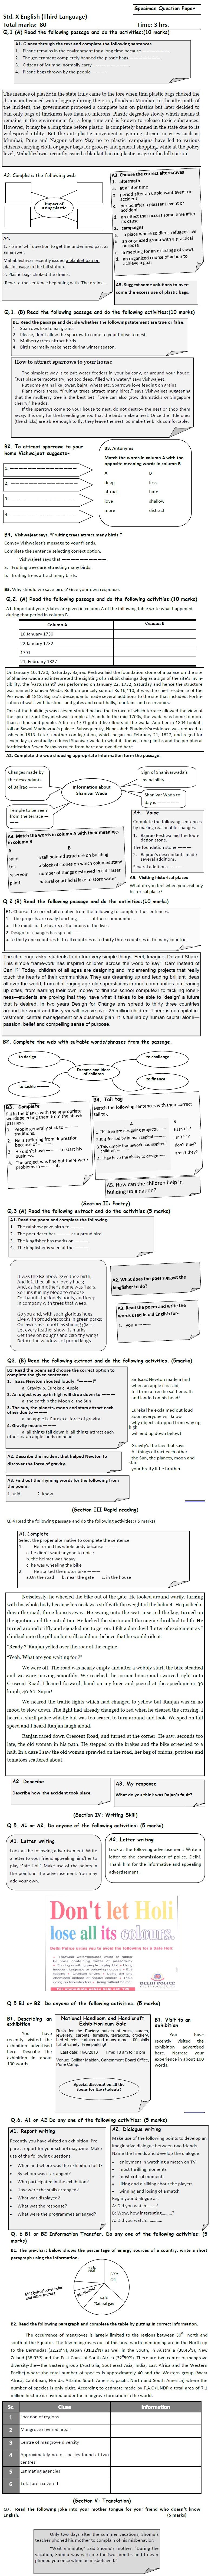 Maharashtra Board Class X Sample Papers - L3